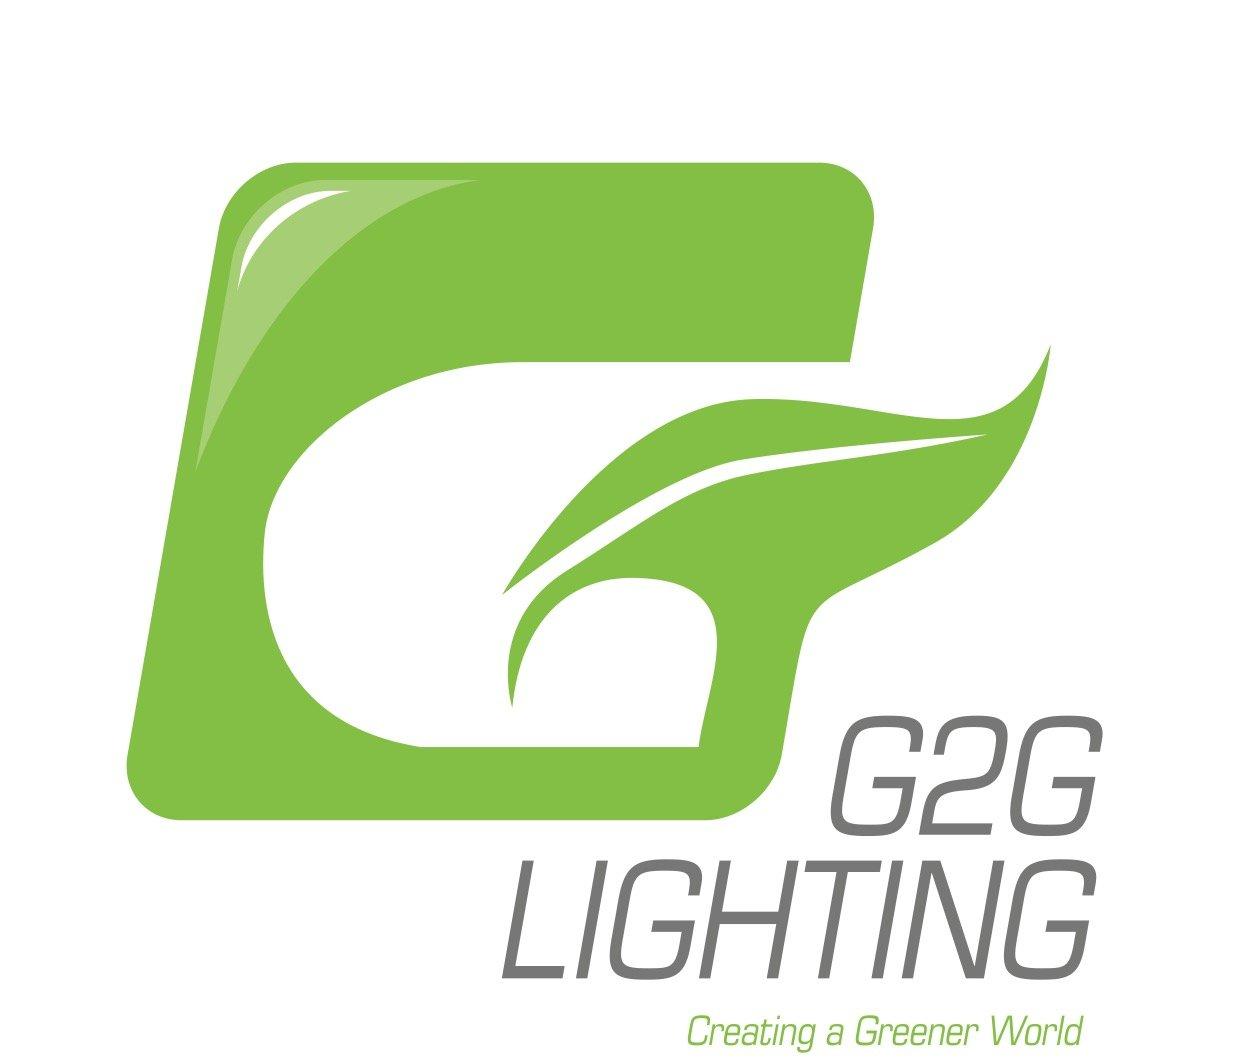 G2G Lighting